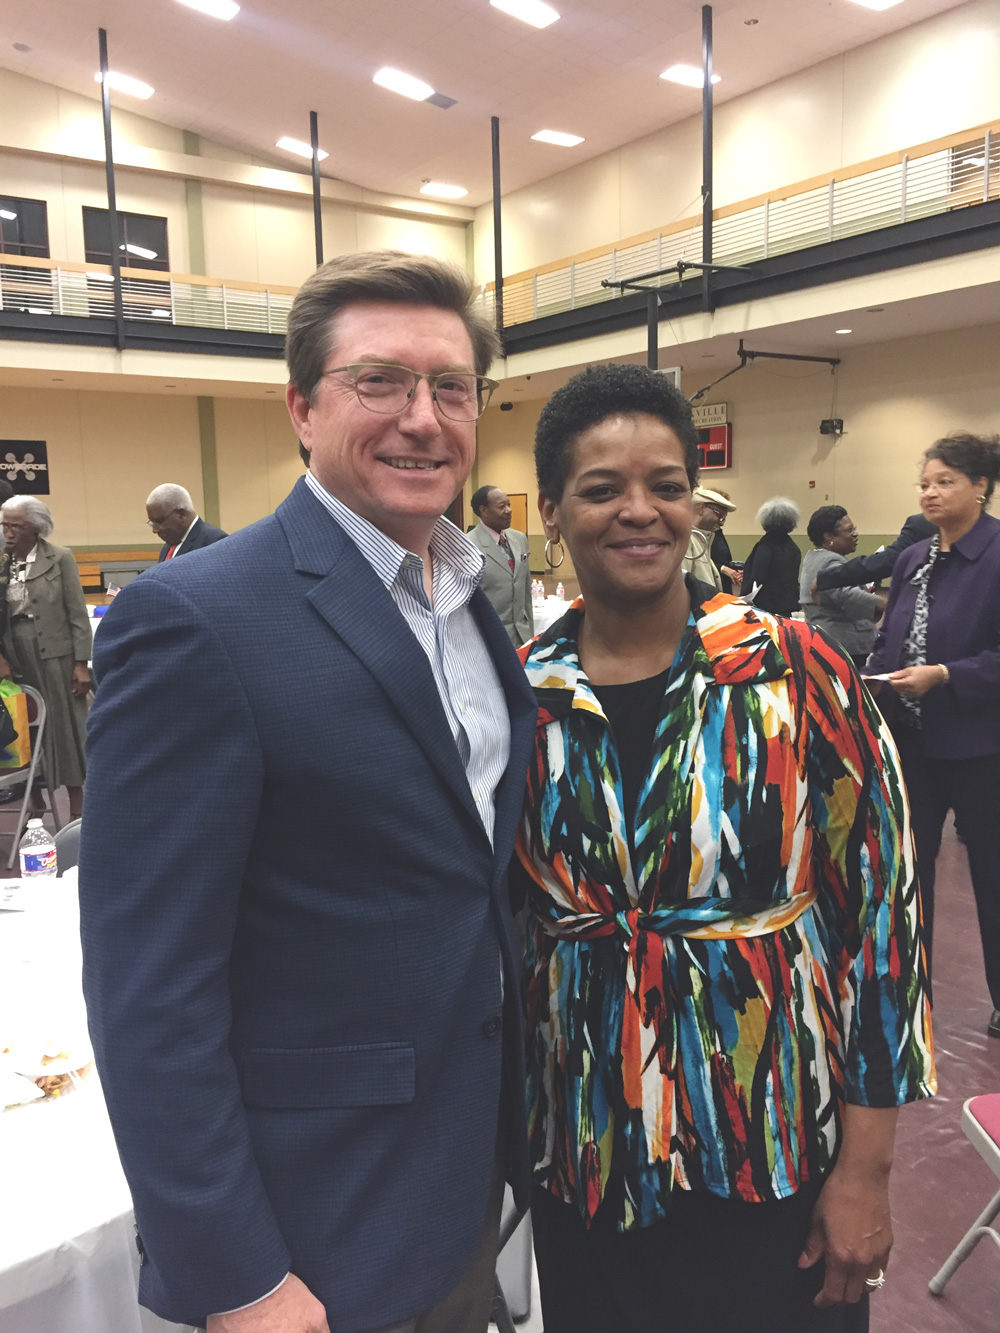 David Baria with Senator Angela Turner Ford